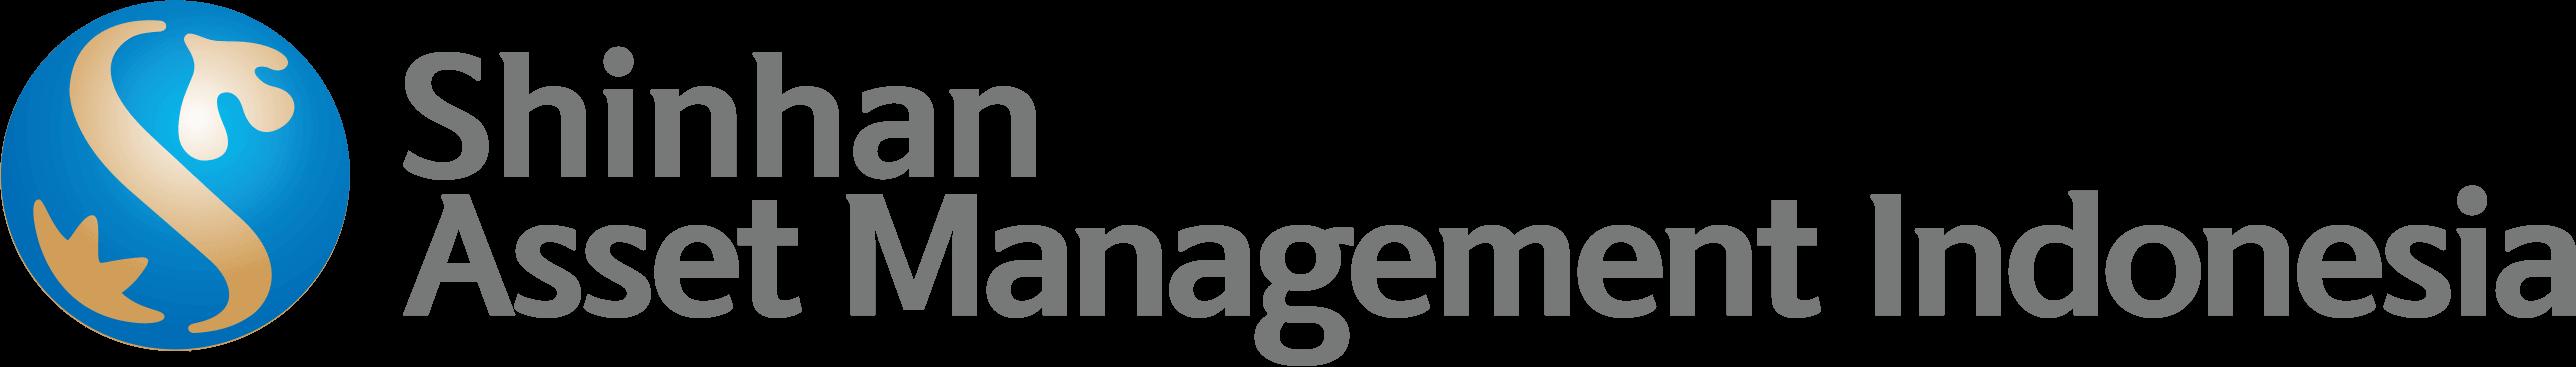 logo Shinhan Asset Management Indonesia